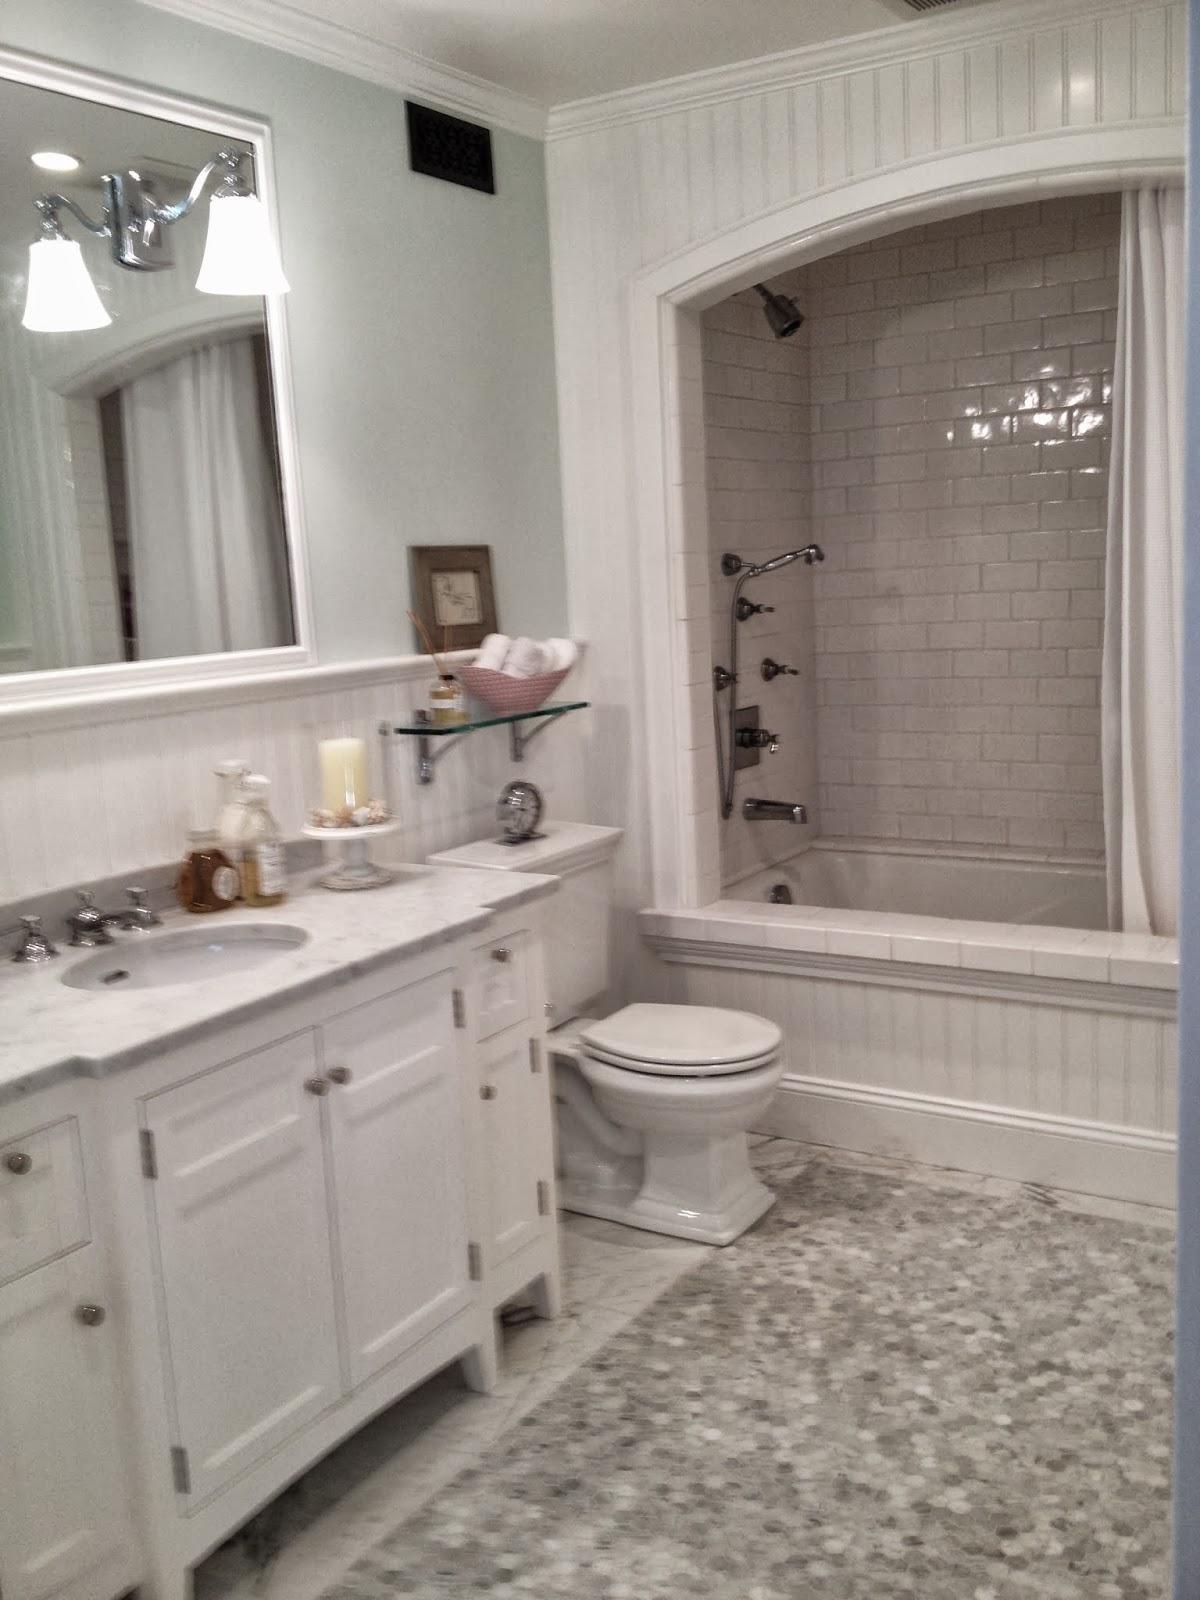 Mortgage loans caroline gerardo home types of mortgage for Bath remodel financing